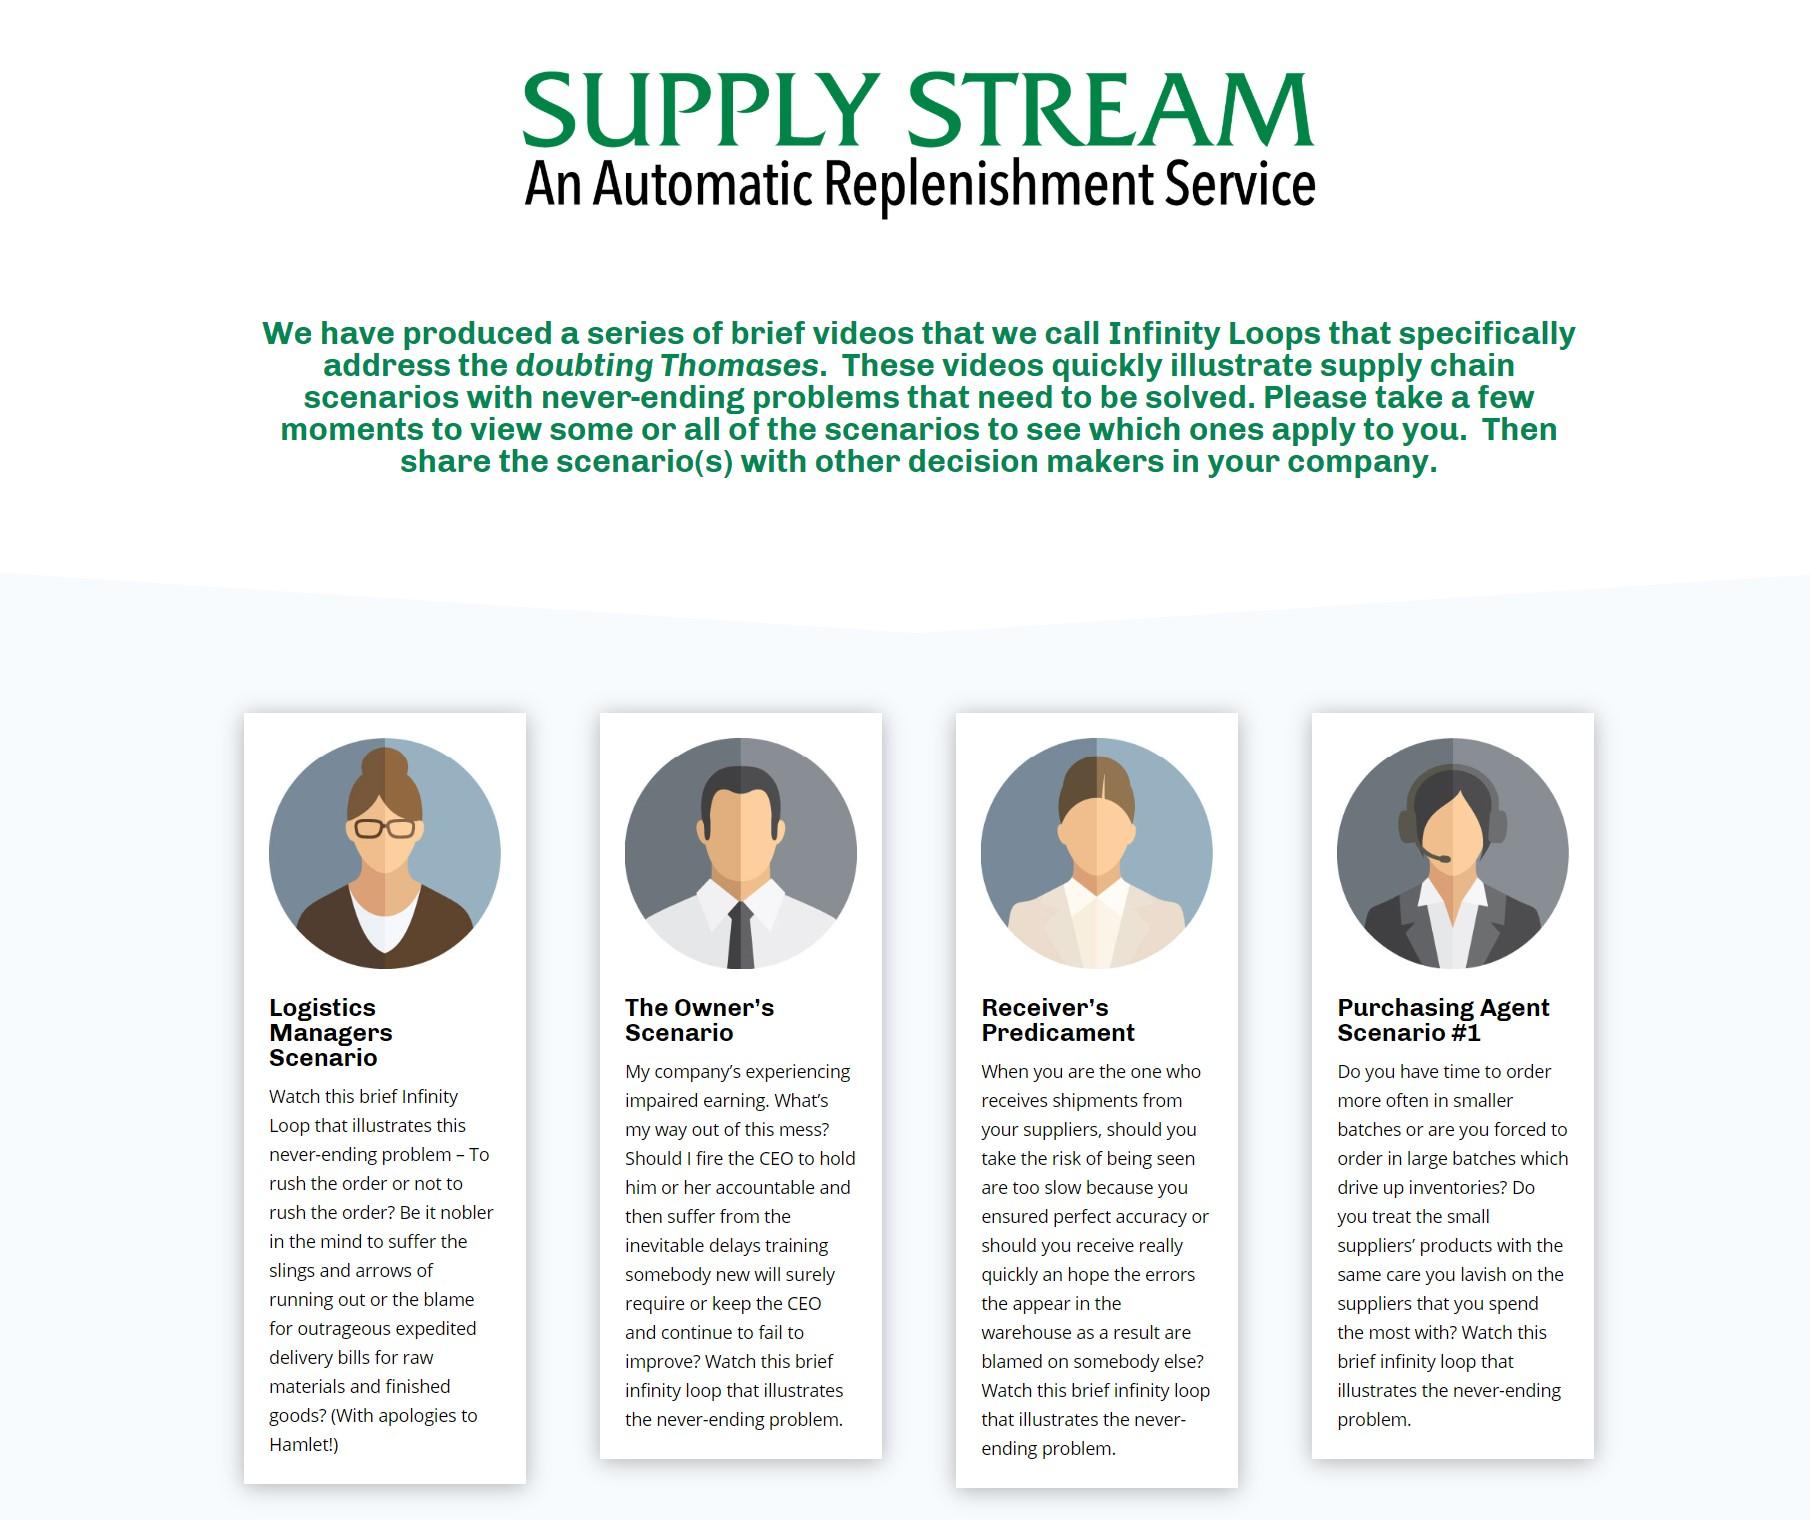 Supply Stream Videos